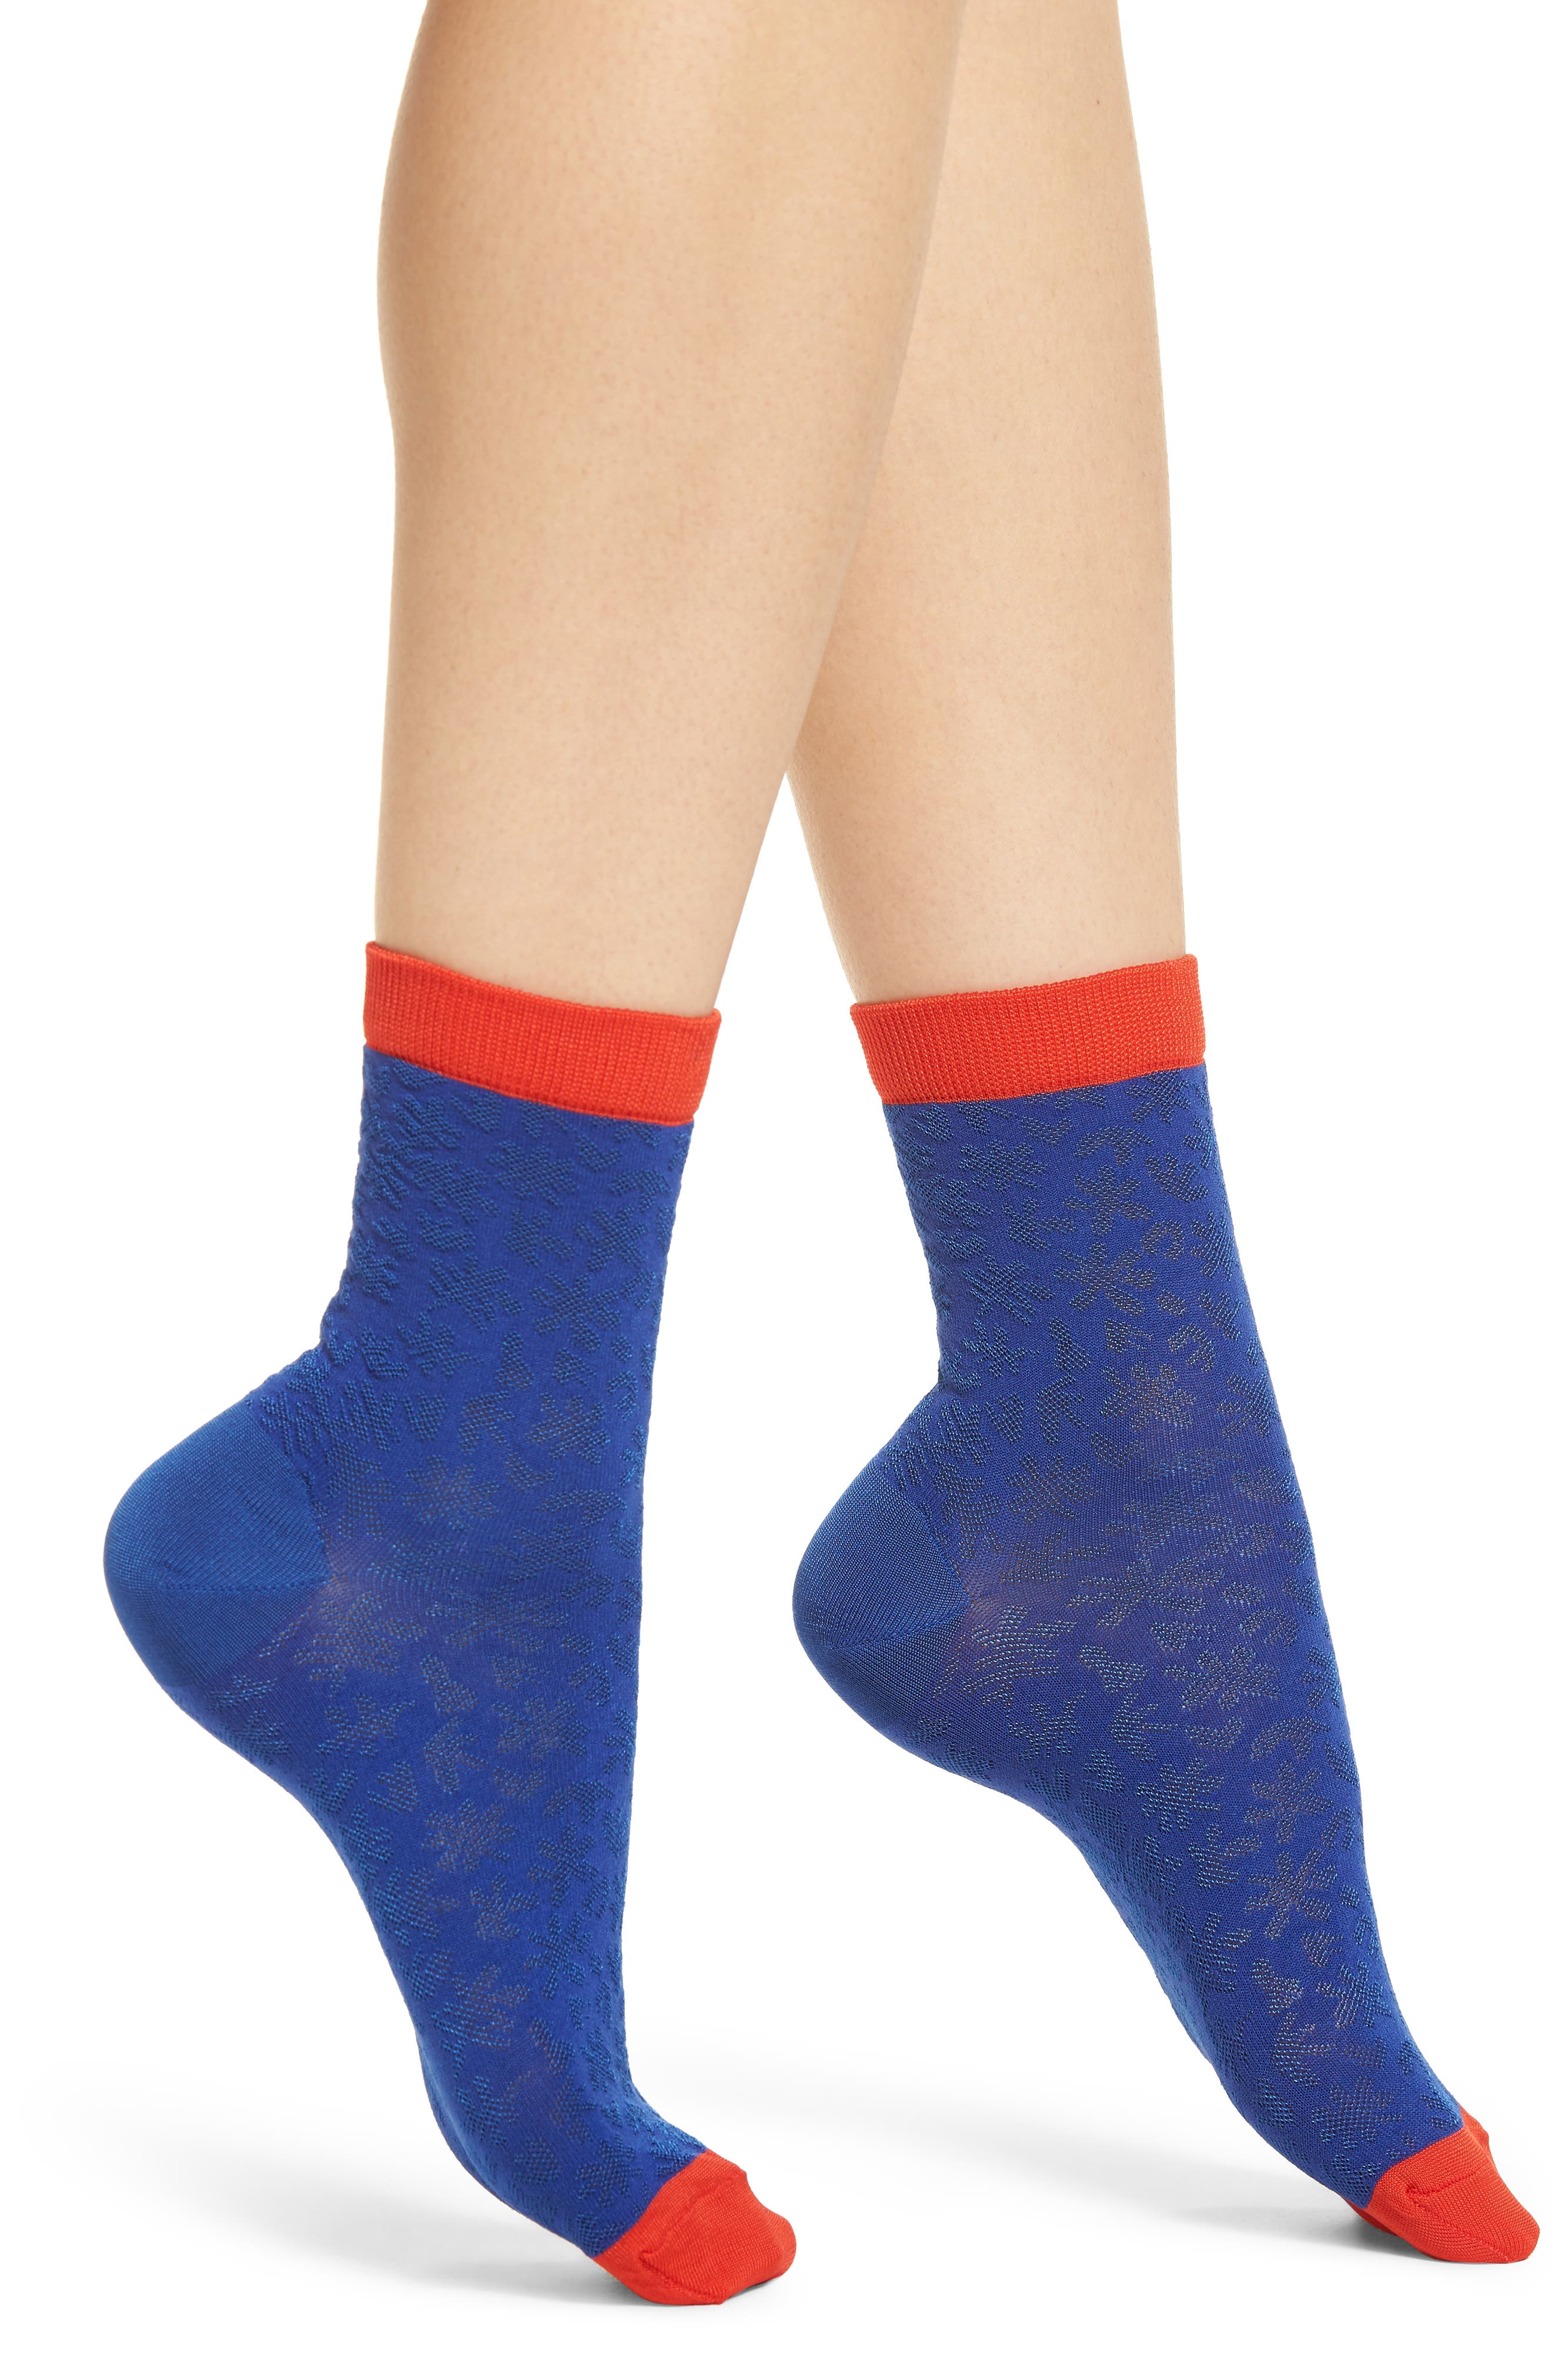 Lotta Ankle Socks,                         Main,                         color, 421